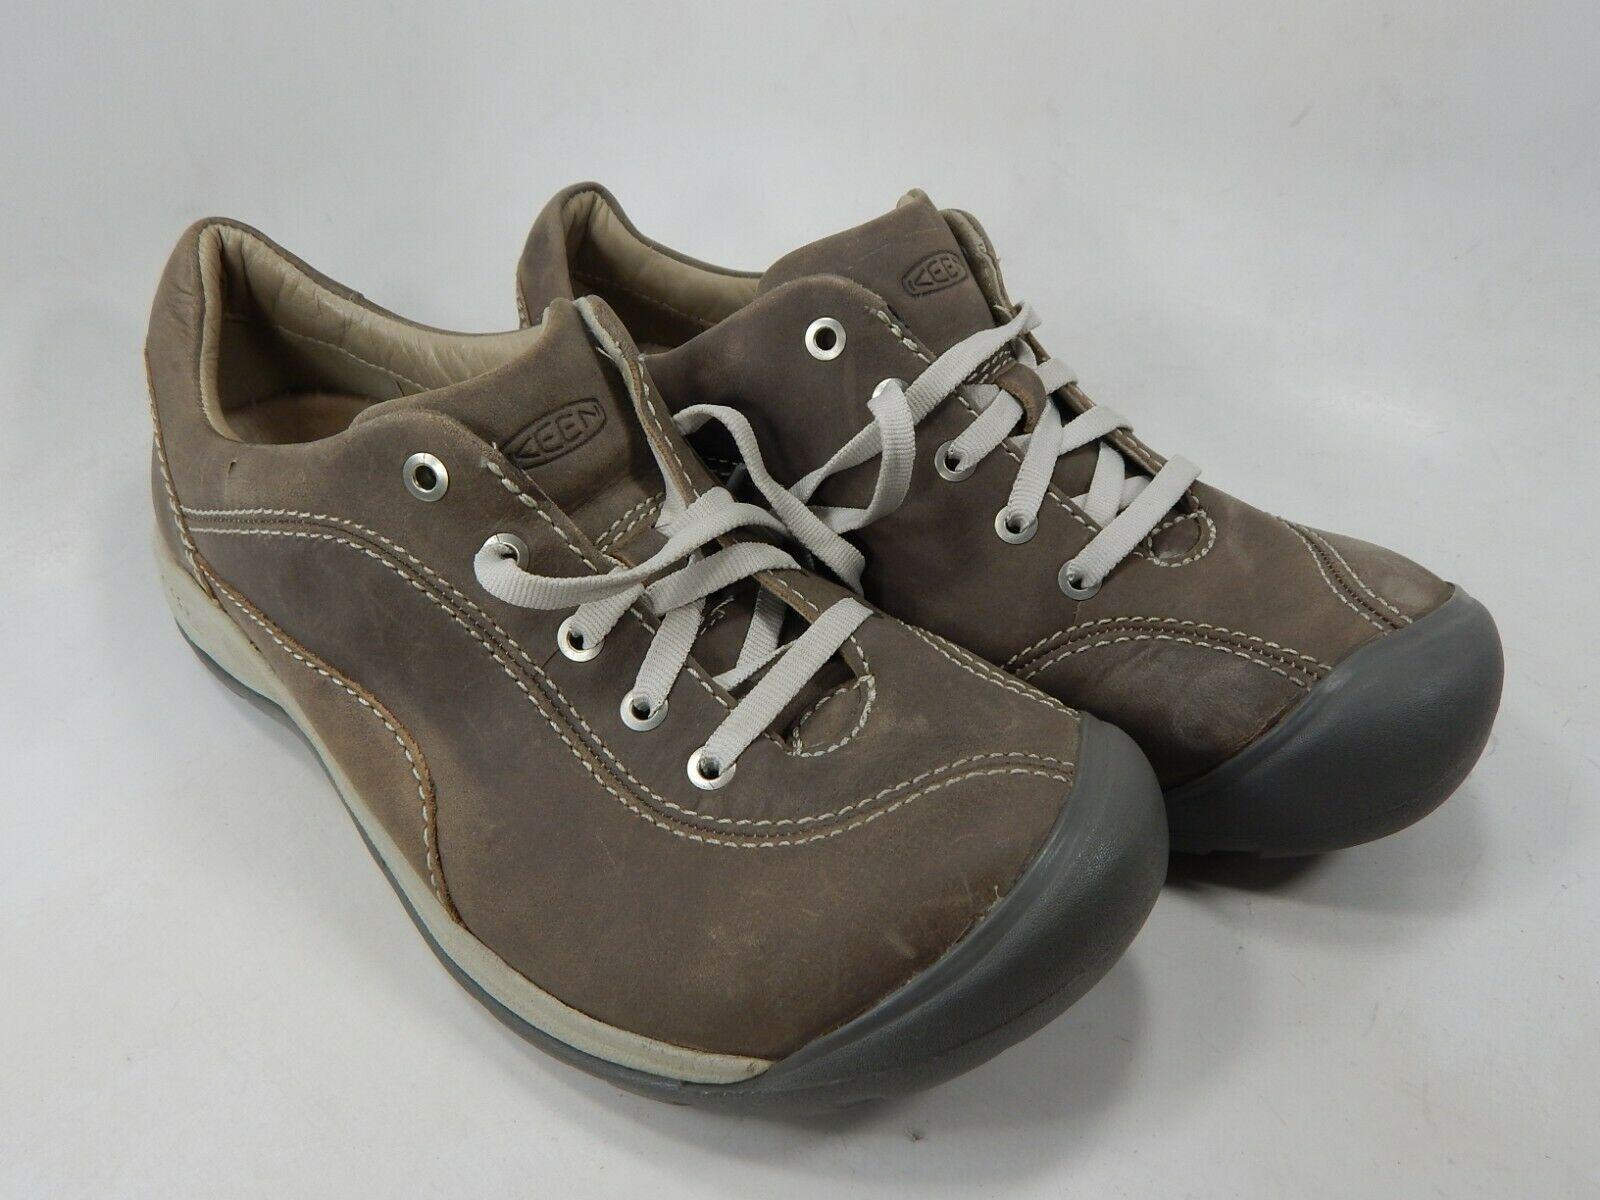 Keen Presidio II Misura 7 M (B) Eu 37.5 Donna Casual Oxford Shoes Paloma 1018316